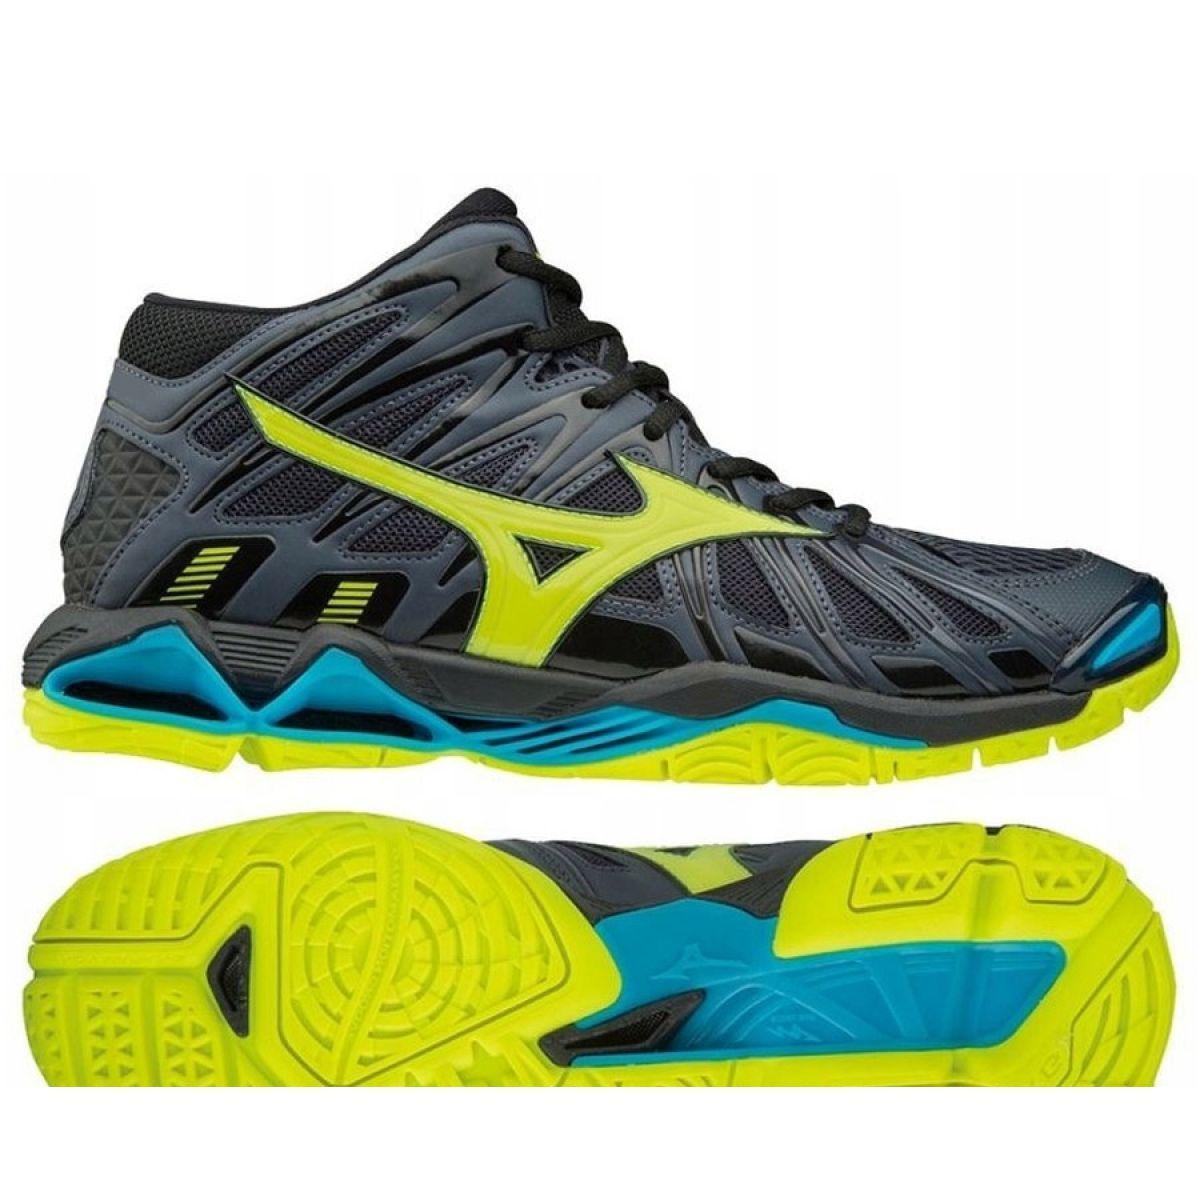 Buty Do Siatkowki Mizuno Wave Tornado X2 Mid M V1ga181747 Szare Czarne Volleyball Shoes Mizuno Shoes Mizuno